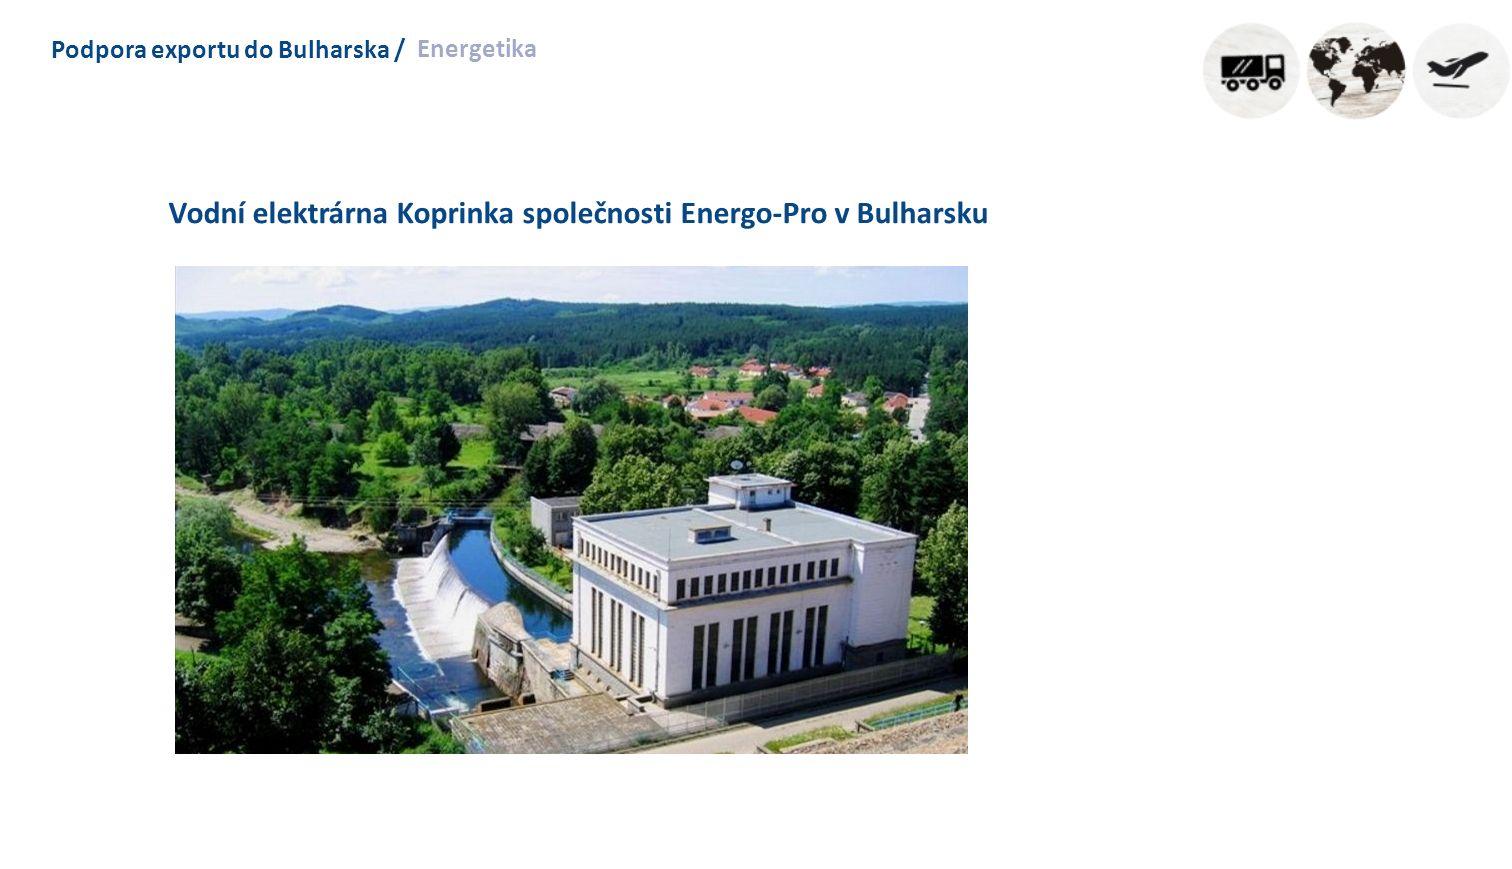 Podpora exportu do Bulharska / Energetika Vodní elektrárna Koprinka společnosti Energo-Pro v Bulharsku